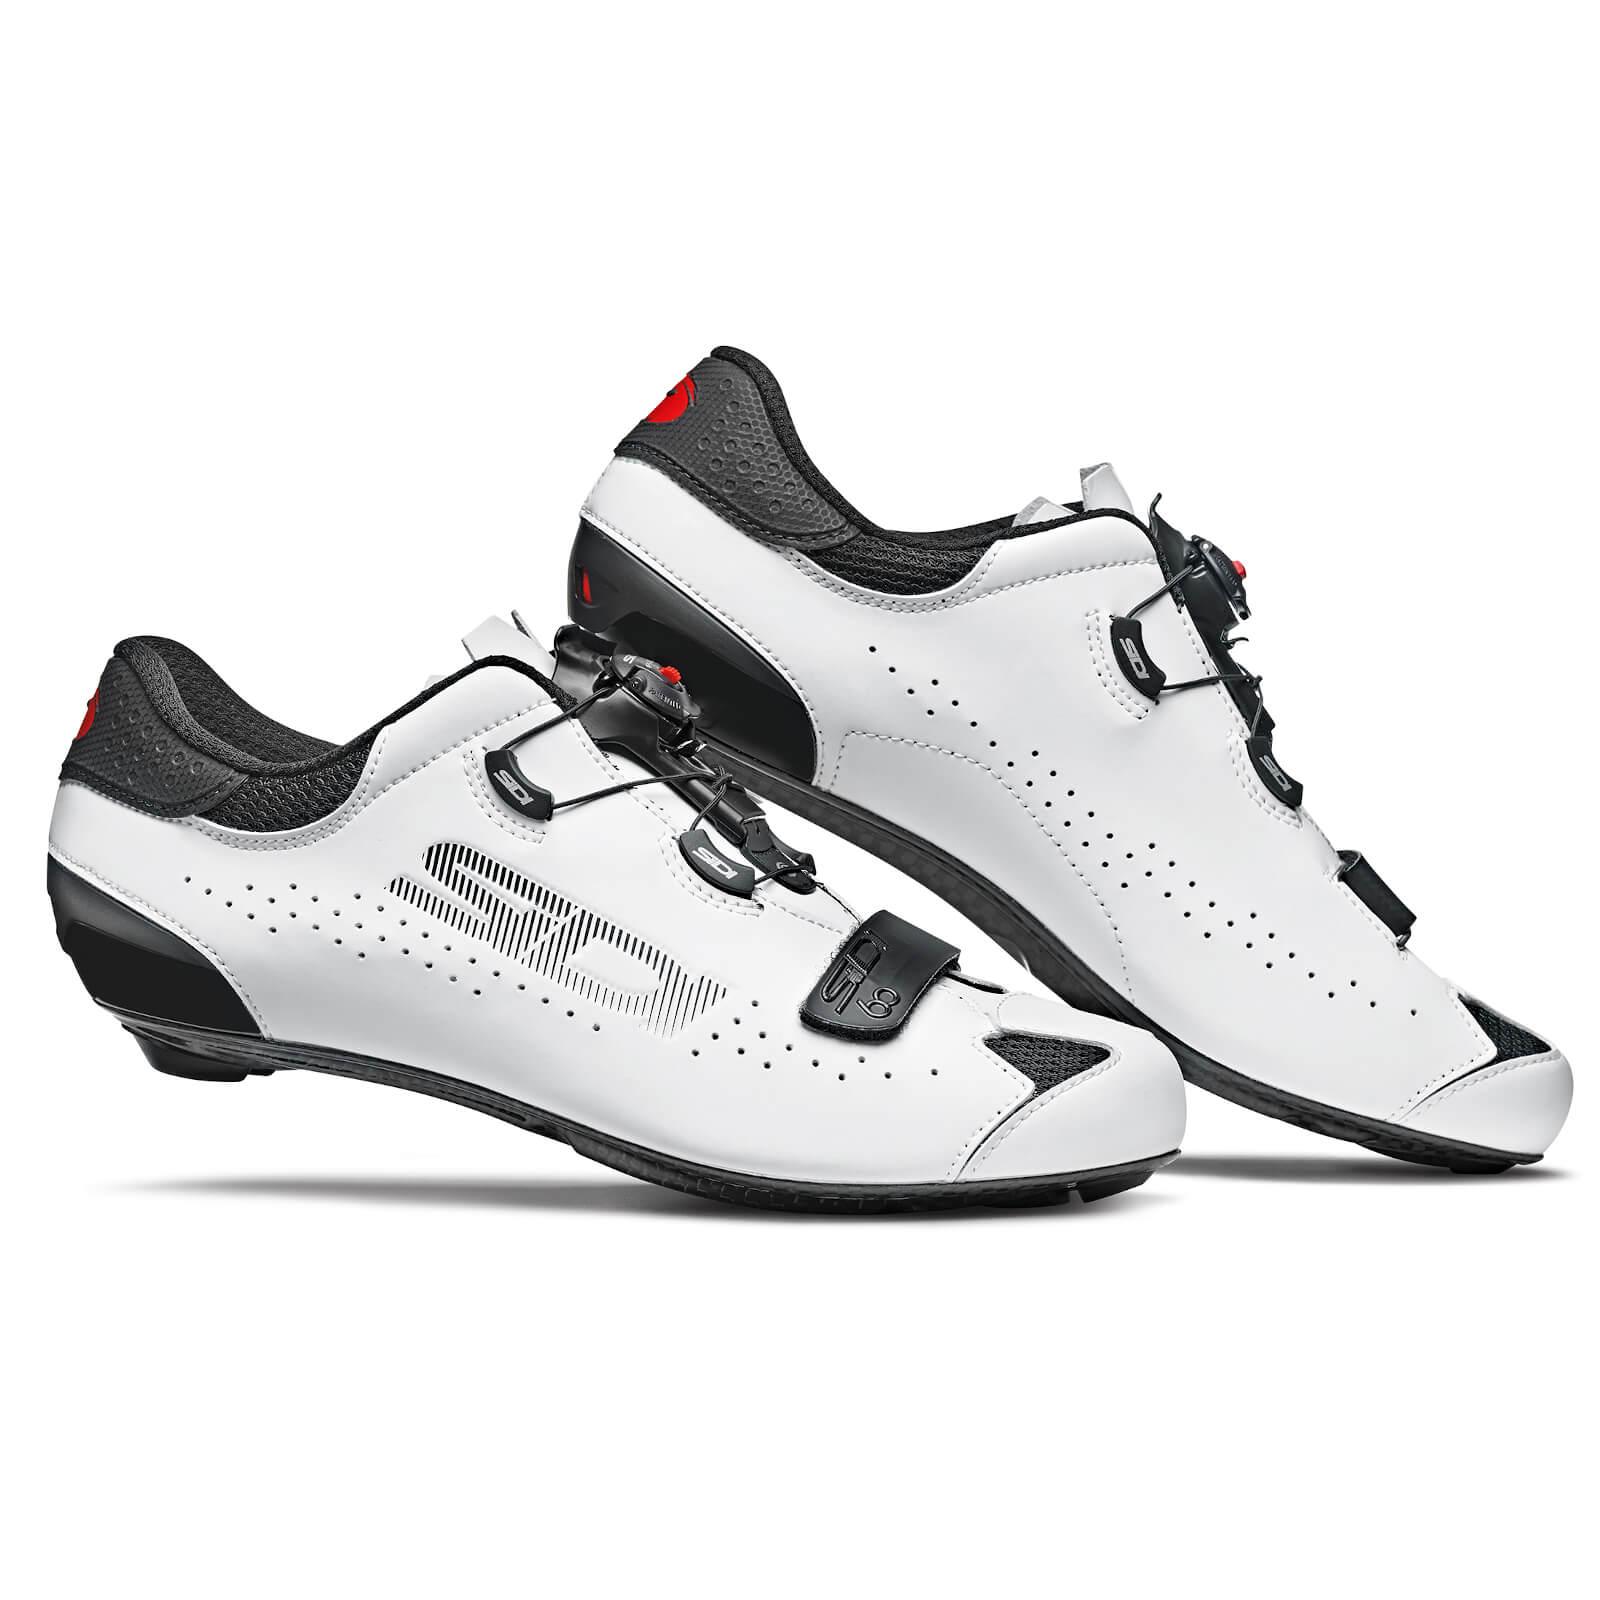 Sidi Sixty Road Shoes - Black/White - EU 44